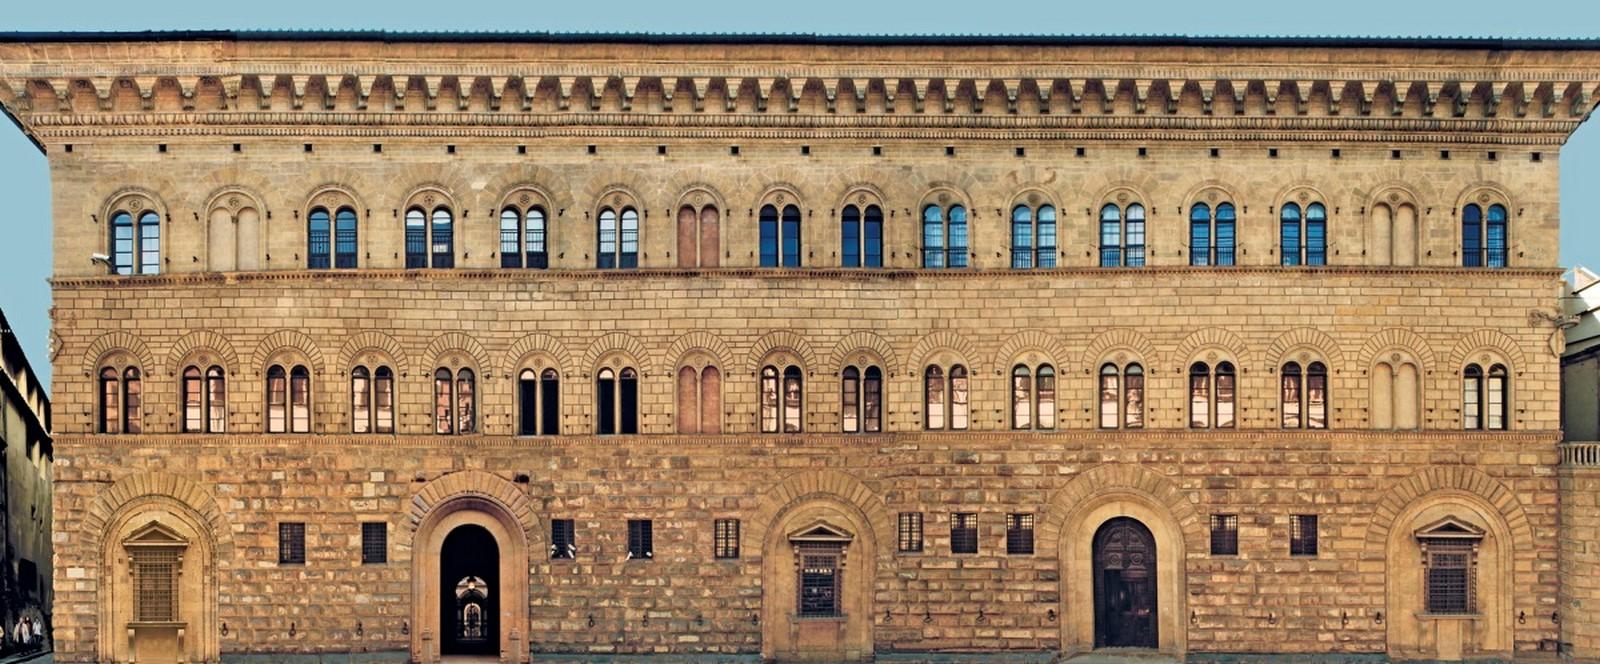 Palazzo Medici-Riccardi, Firenze - Sheet1